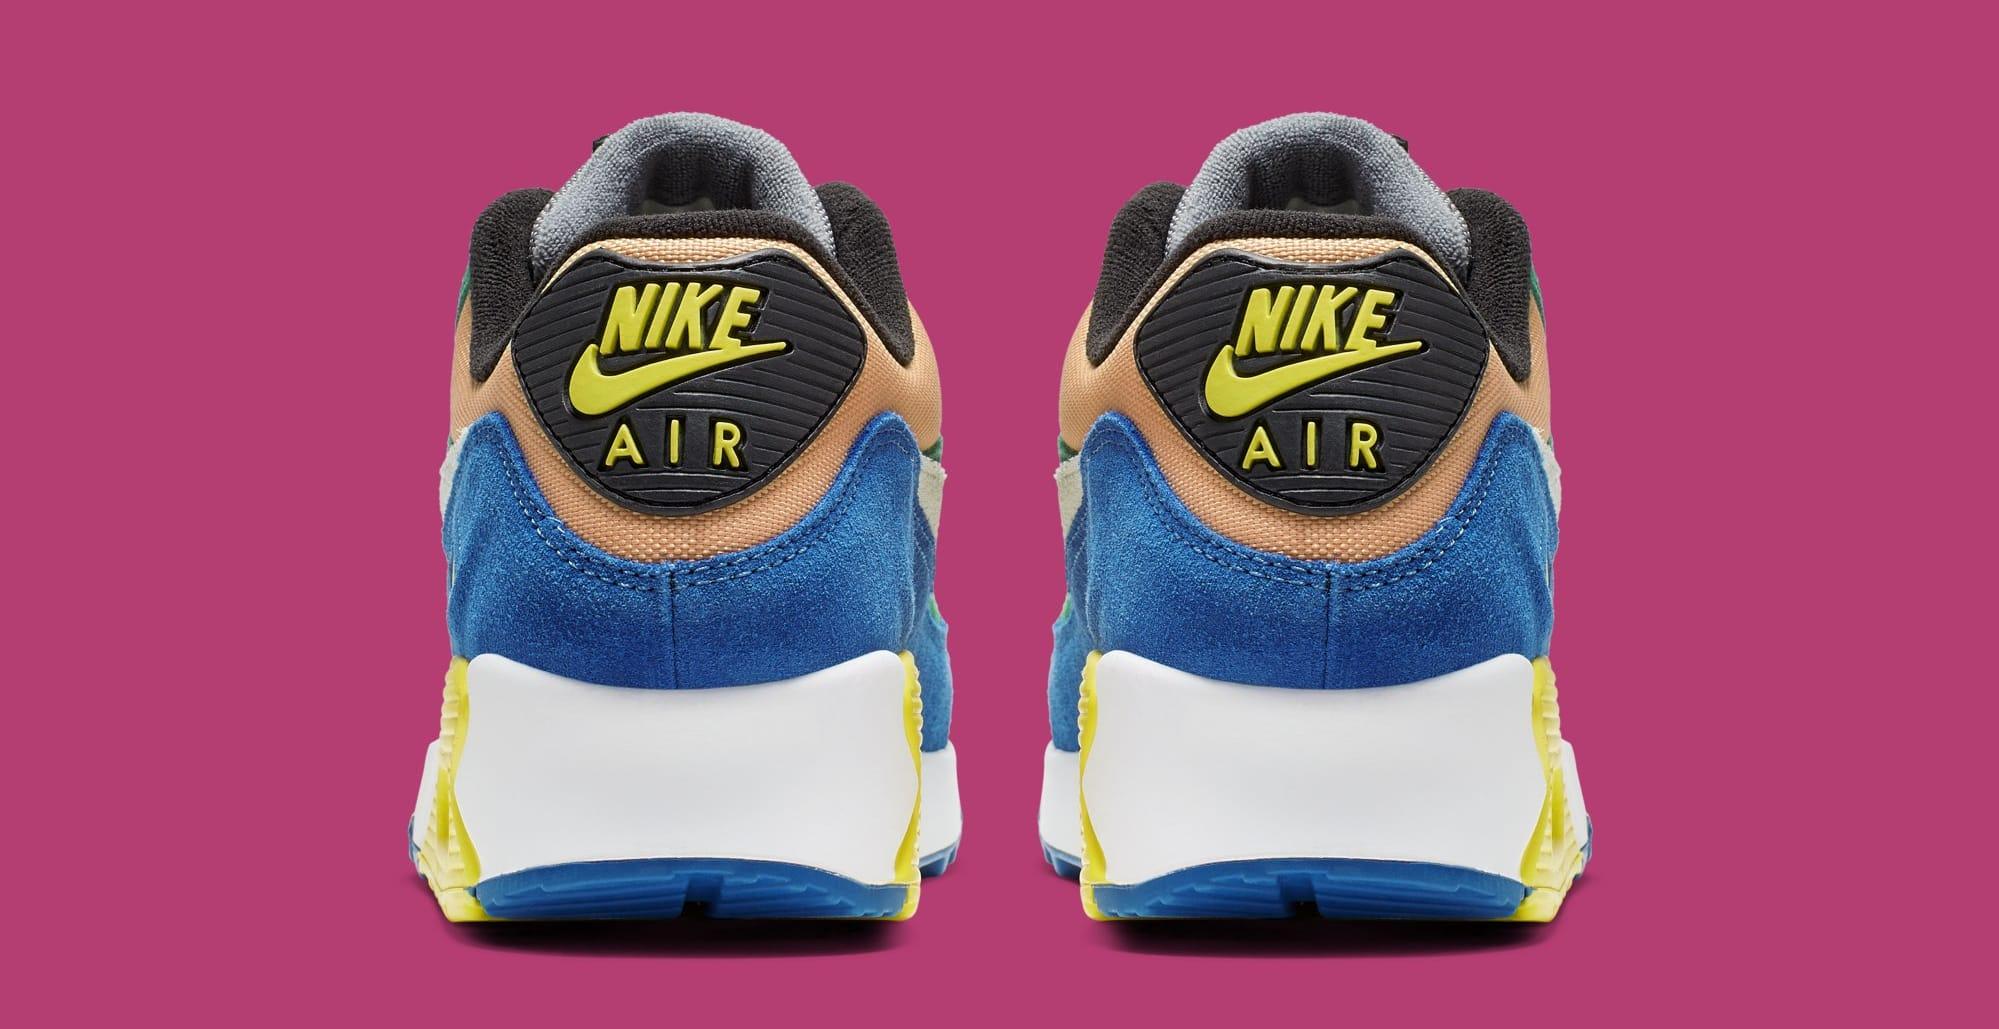 Nike Air Max 90 QS 'Viotech' Lucid Green/Game Royal CD0917-300 (Heel)